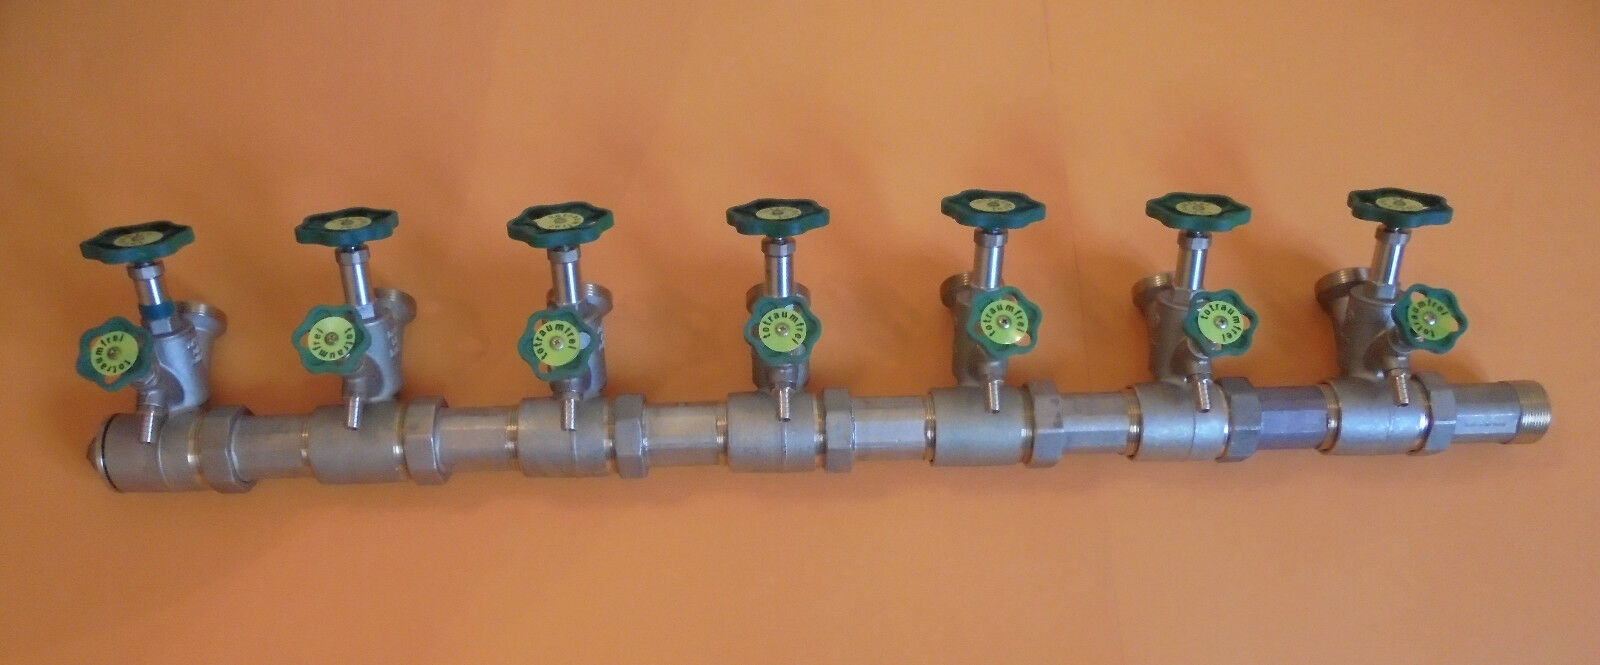 Schlößer Verteiler Kompaktverteiler Wasserverteiler DN50 x DN25,  7 fach